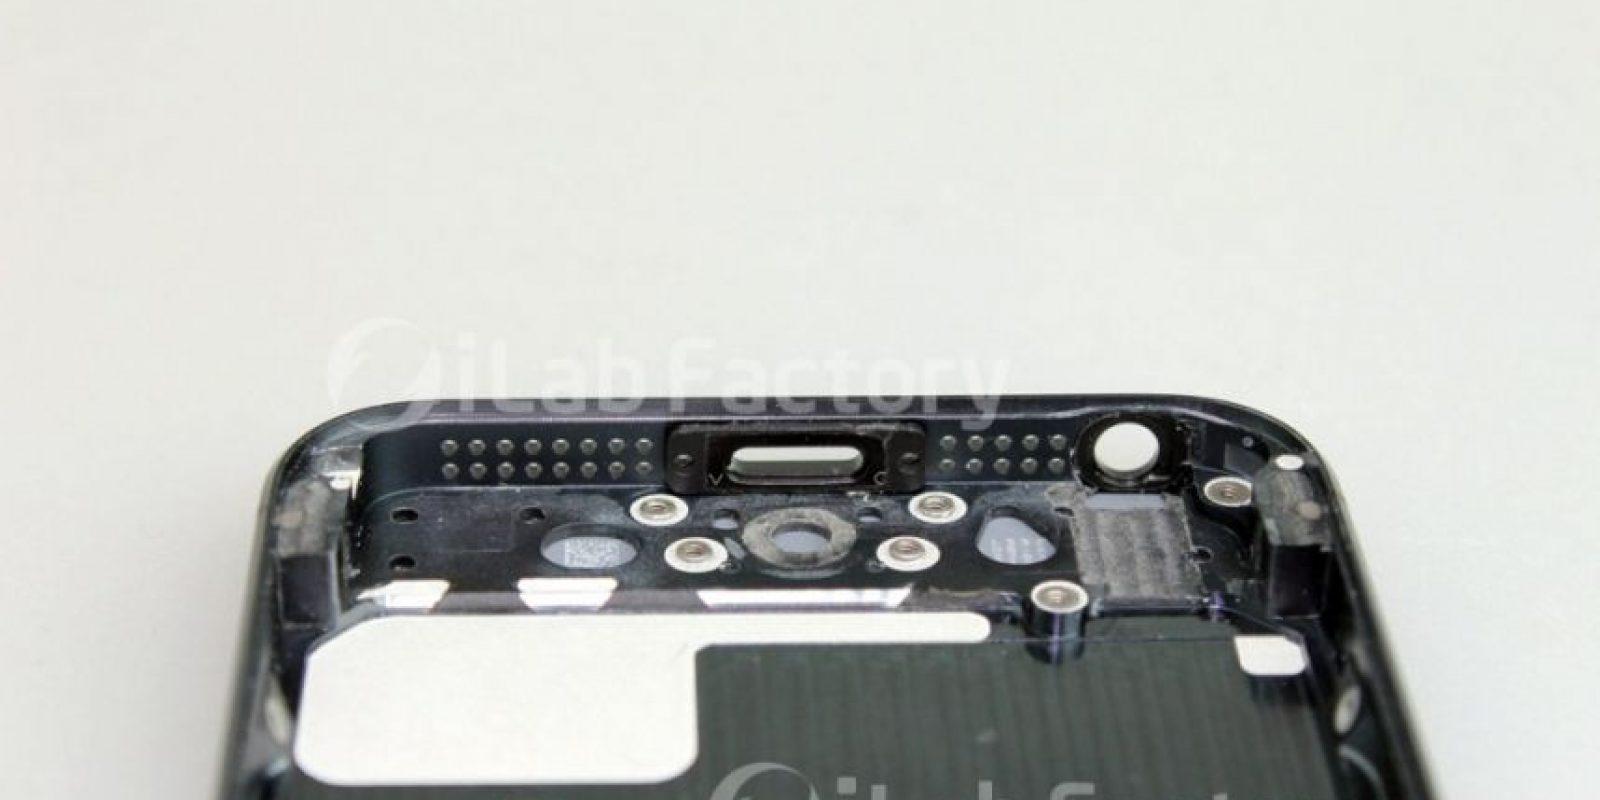 Foto:Vía appleweblog.com